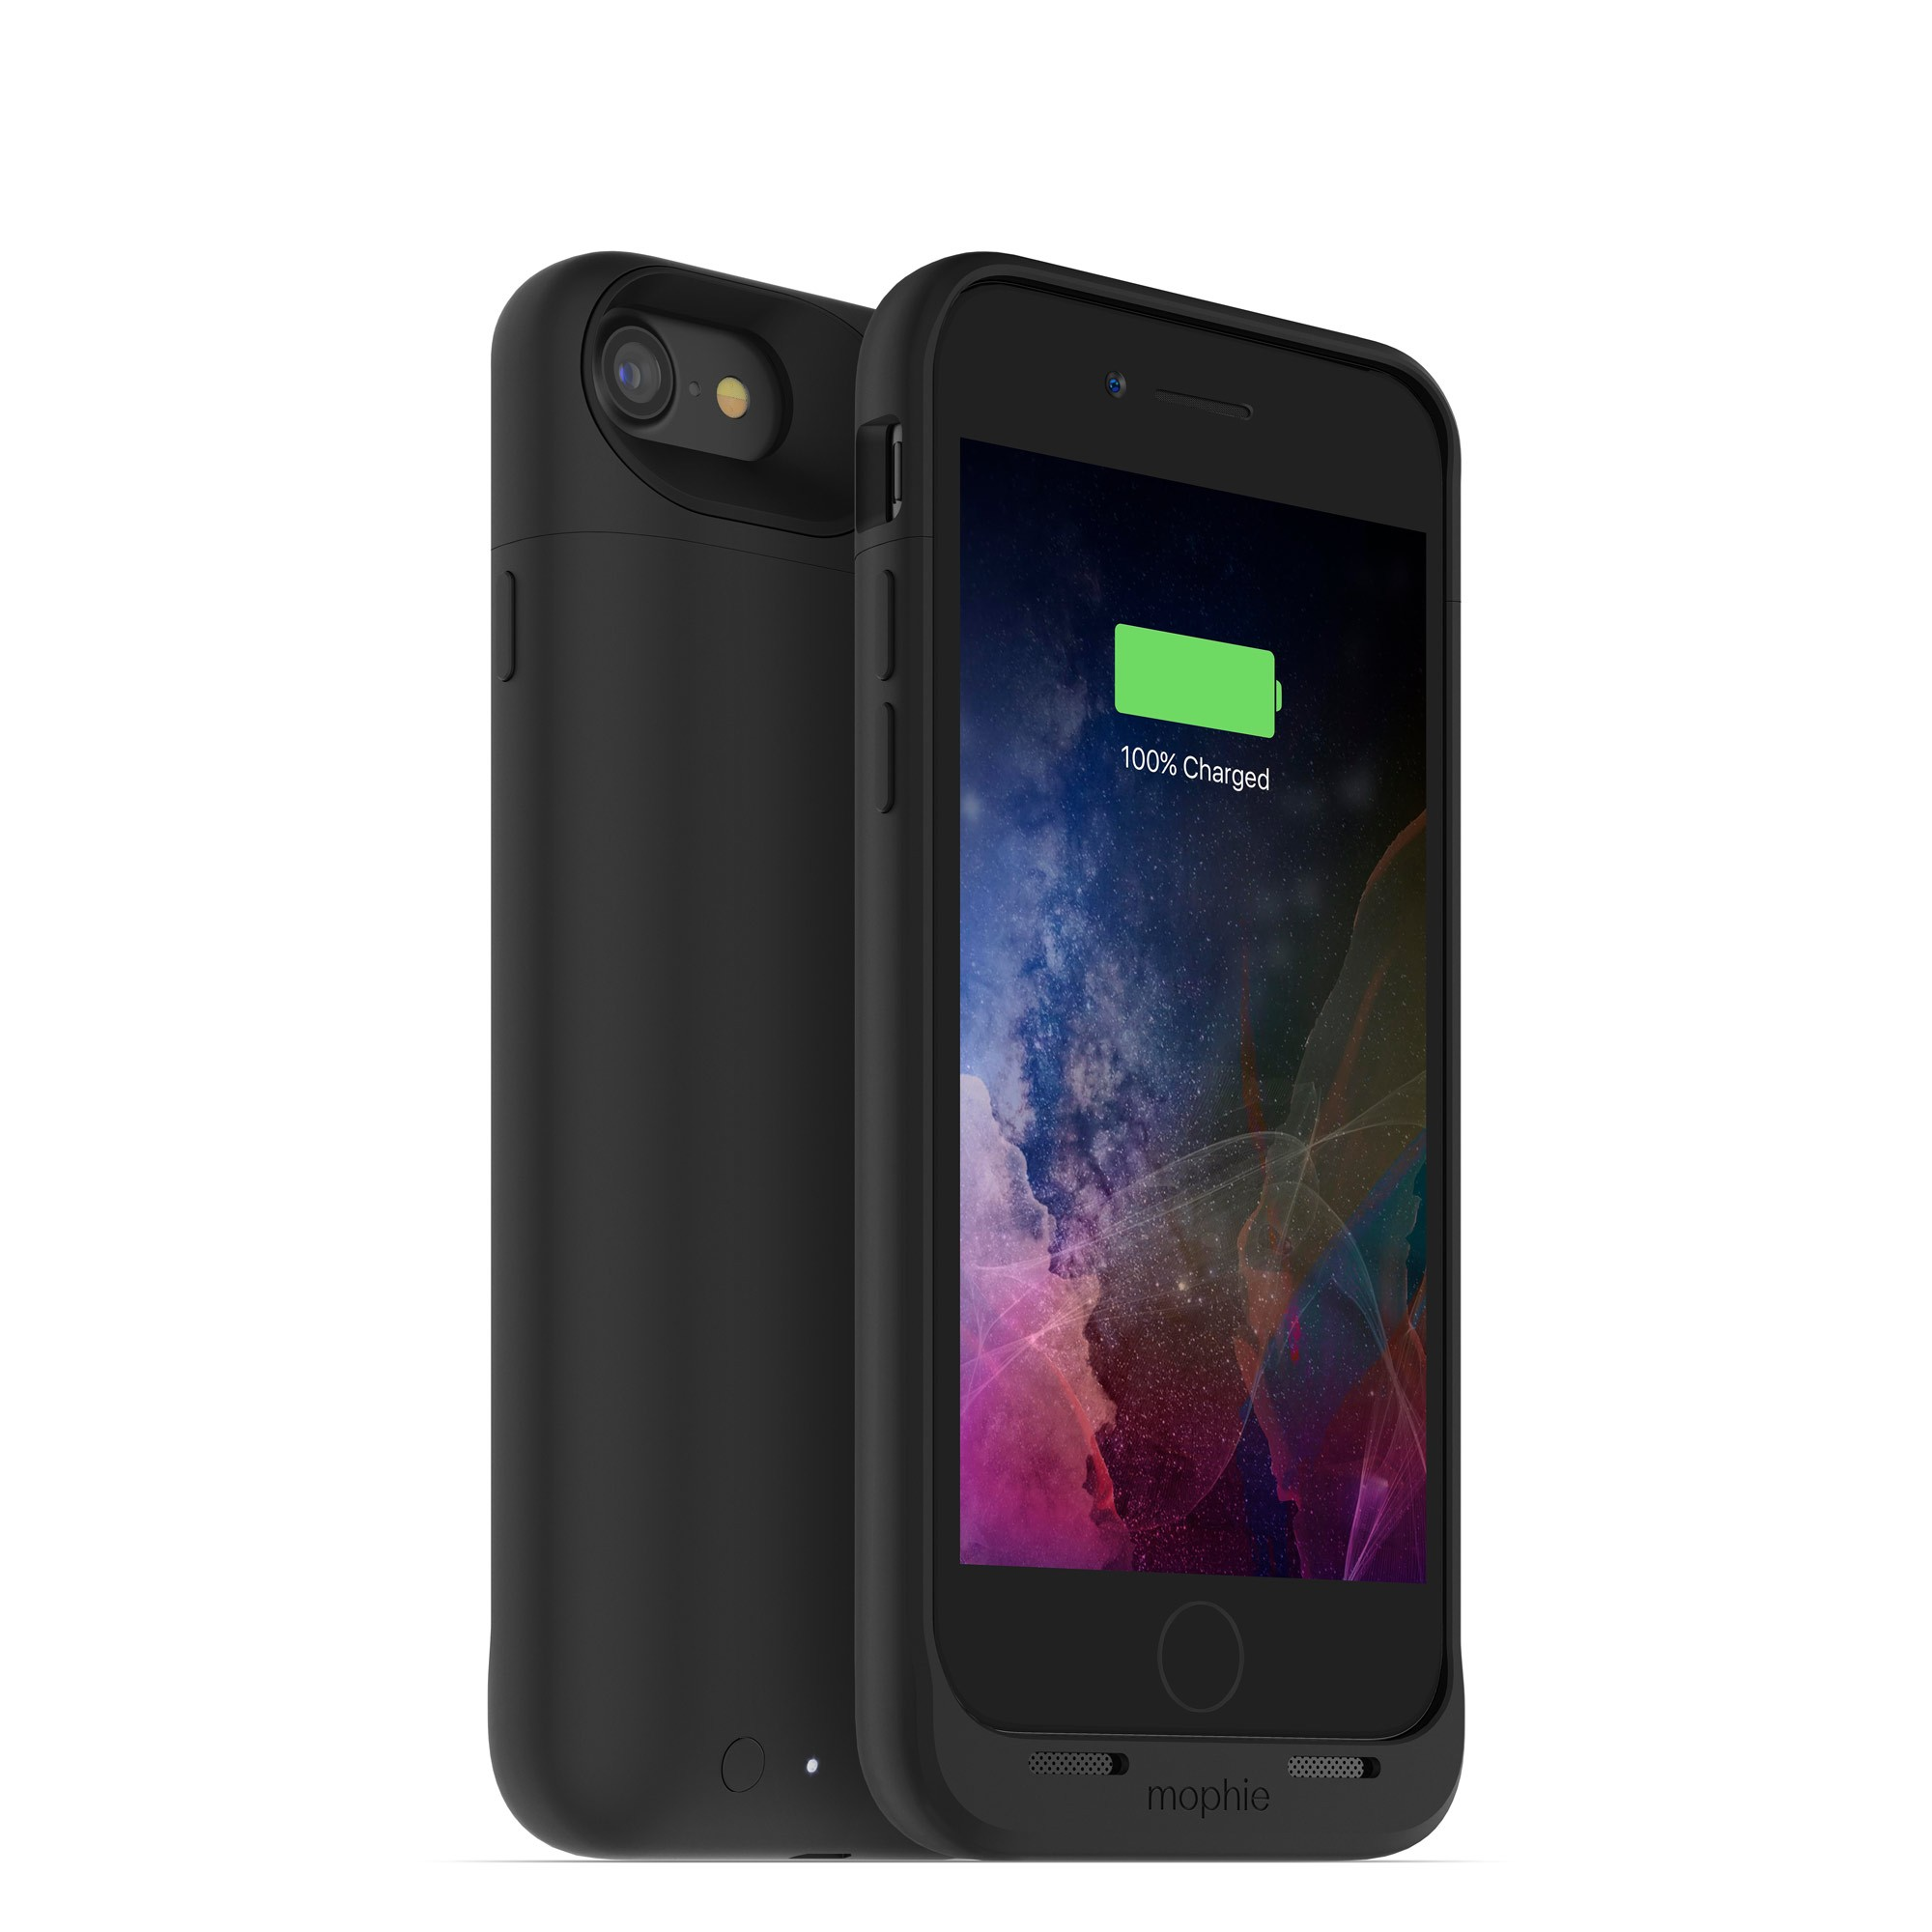 Nabíjecí pouzdro pro Apple iPhone 7 - Mophie, Juice Pack Air 2525mAh Black